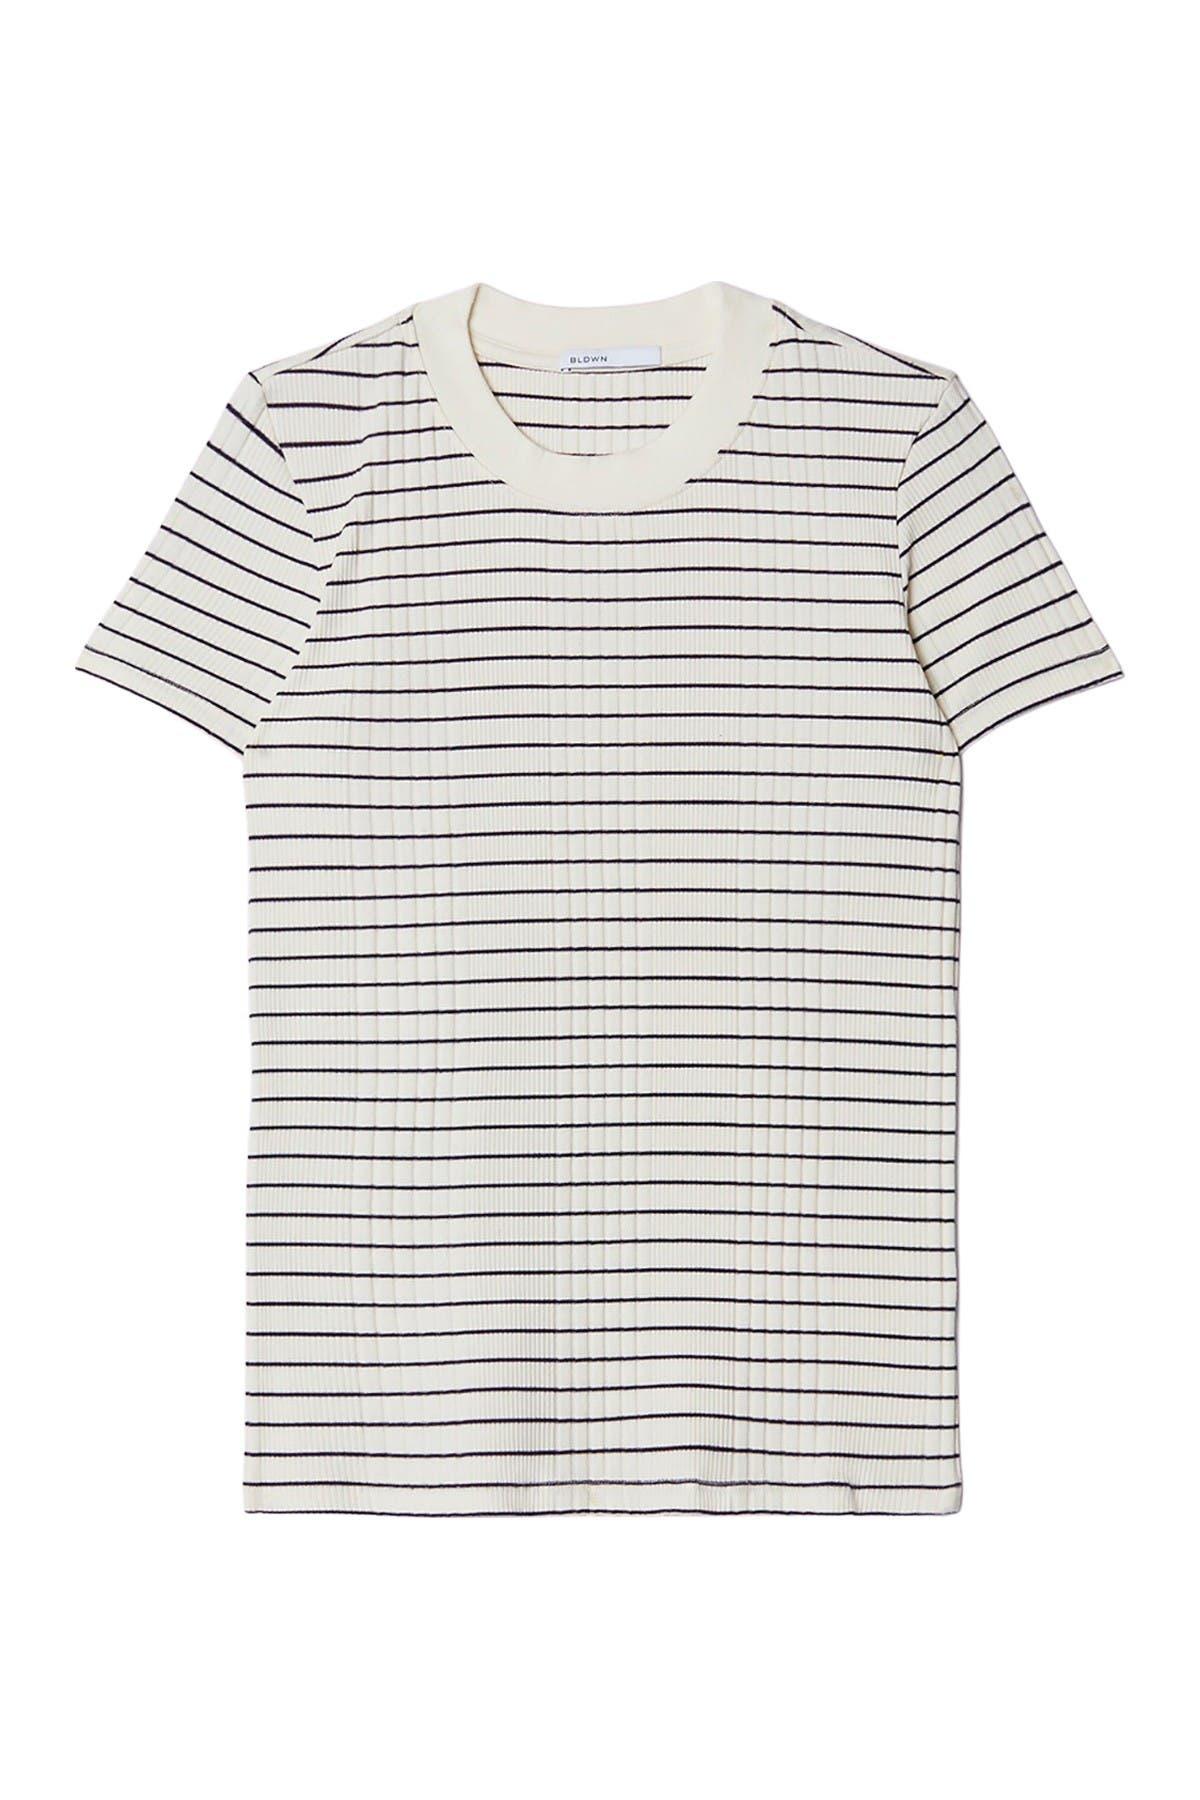 Image of BLDWN Perry Shirt